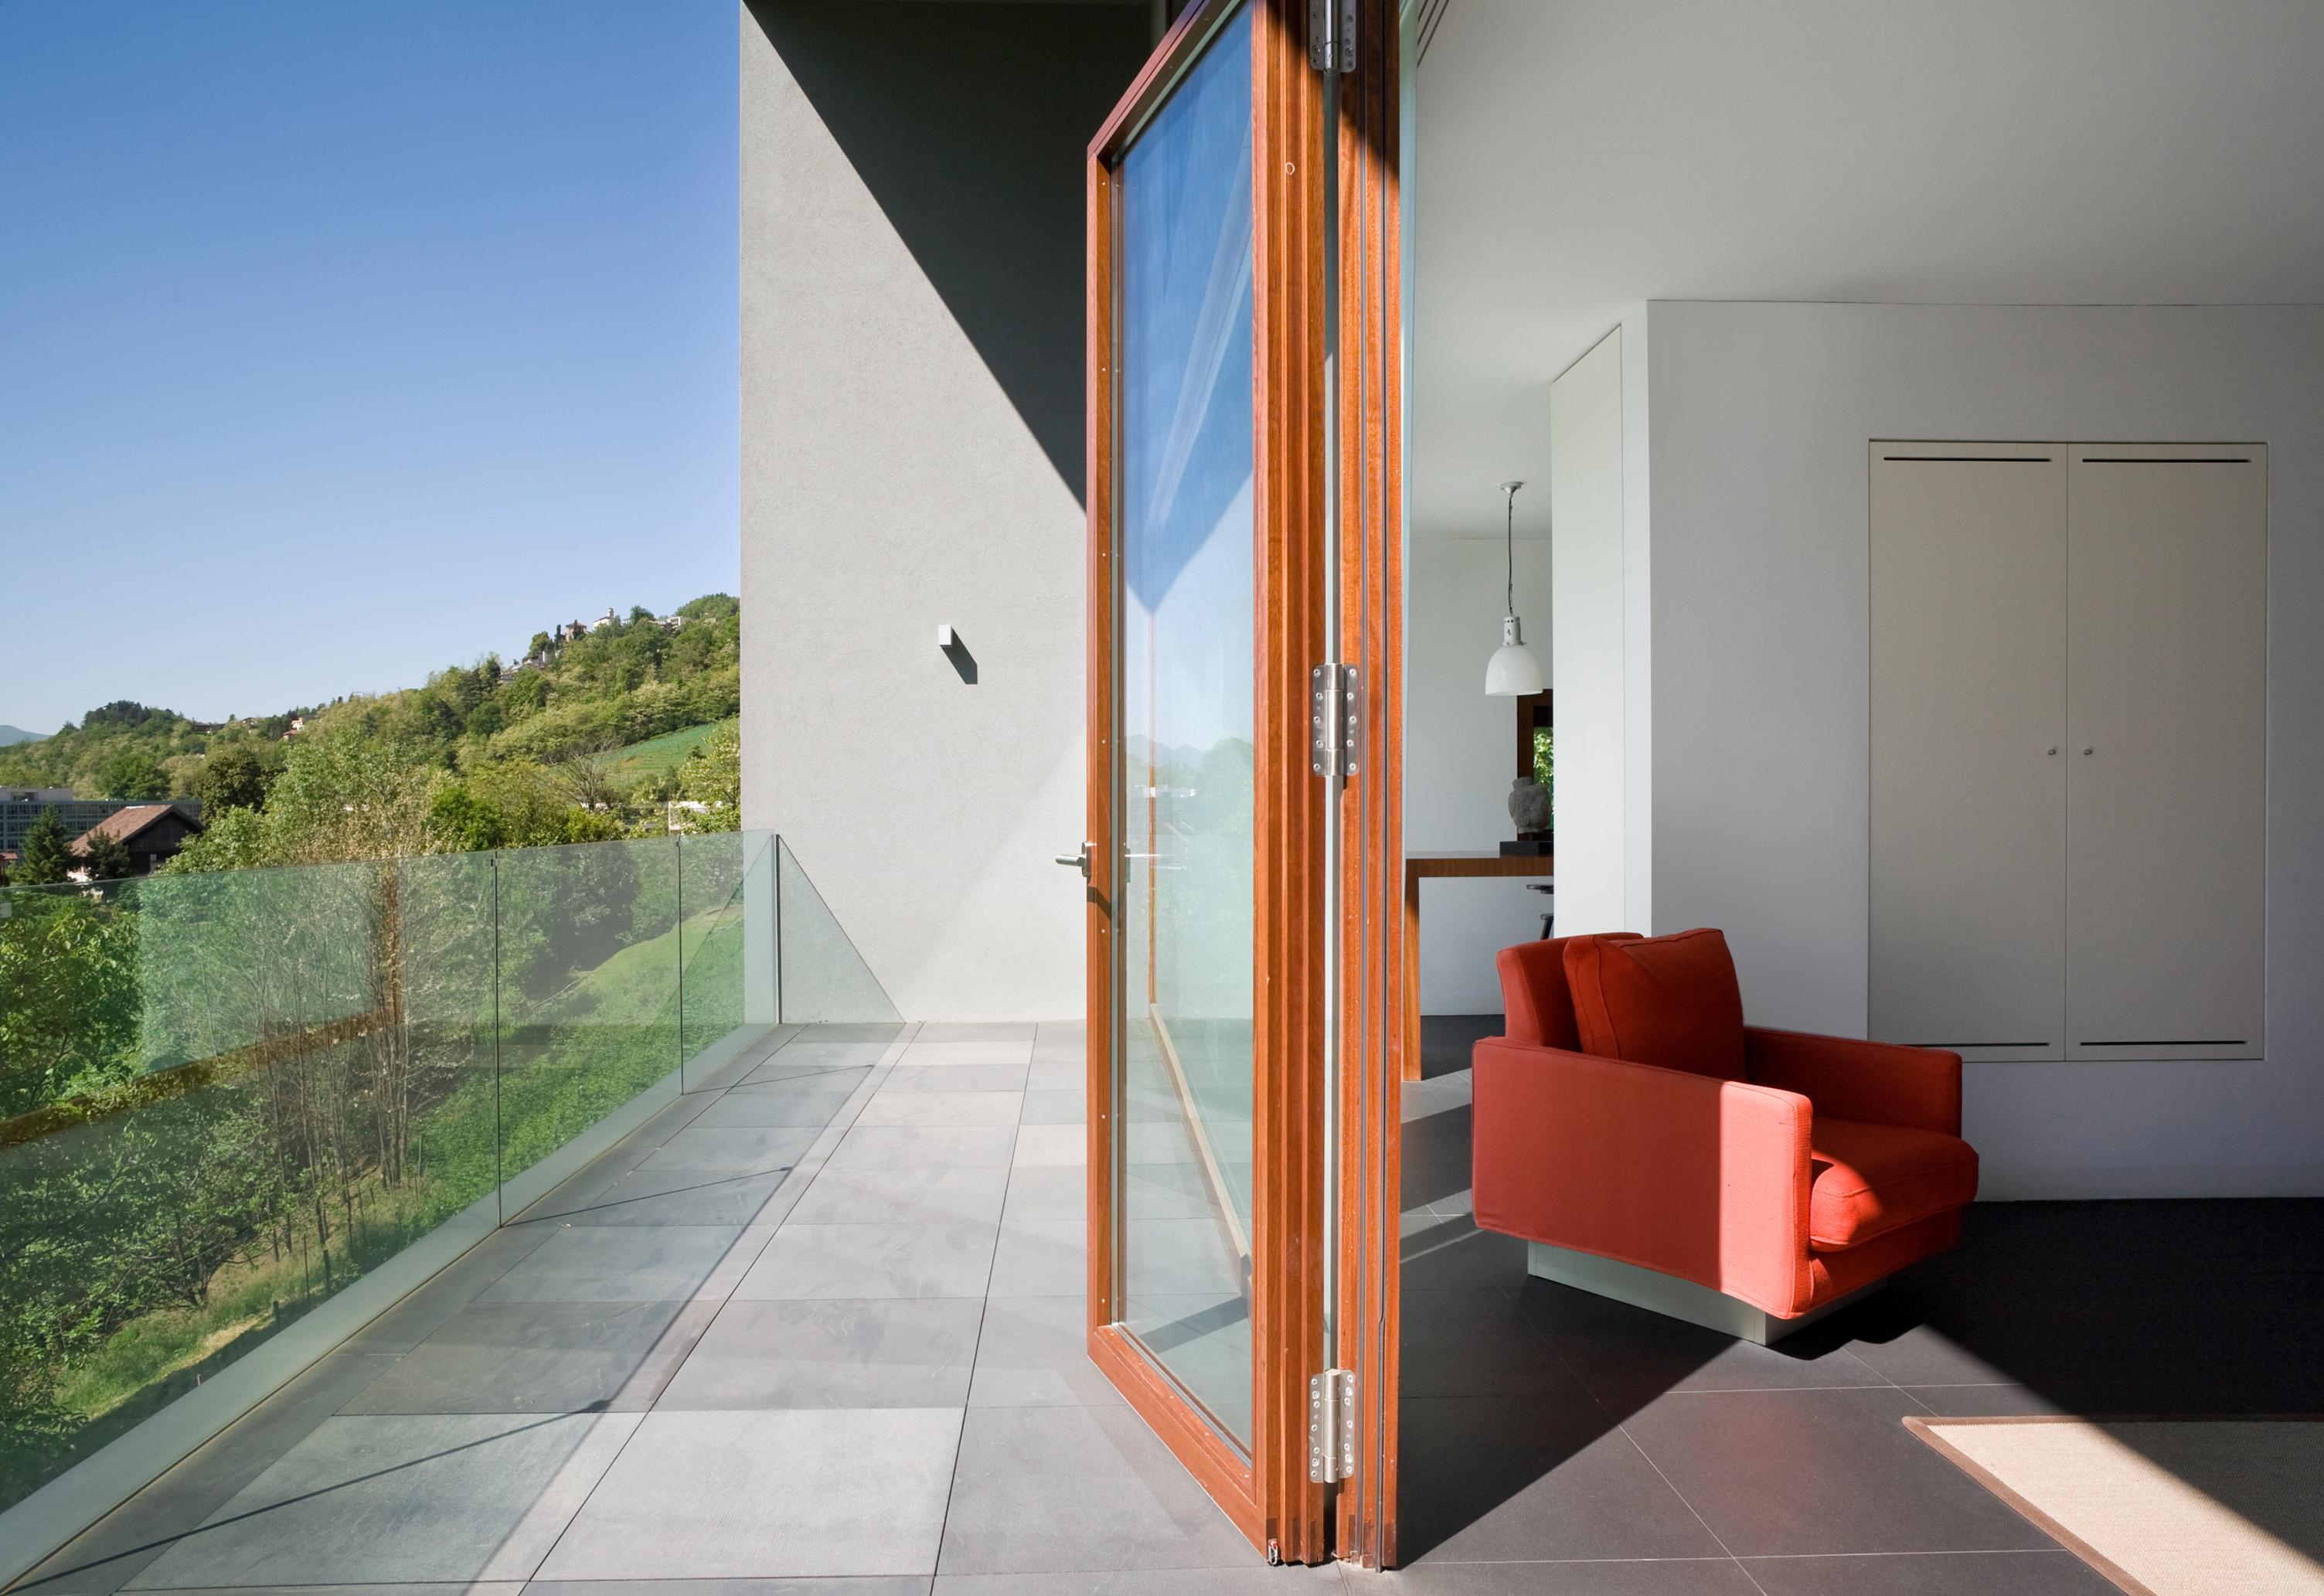 produkty-baumit-do-ukladania-plytek-idealny-sposob-na-estetyczny-balkon-i-taras